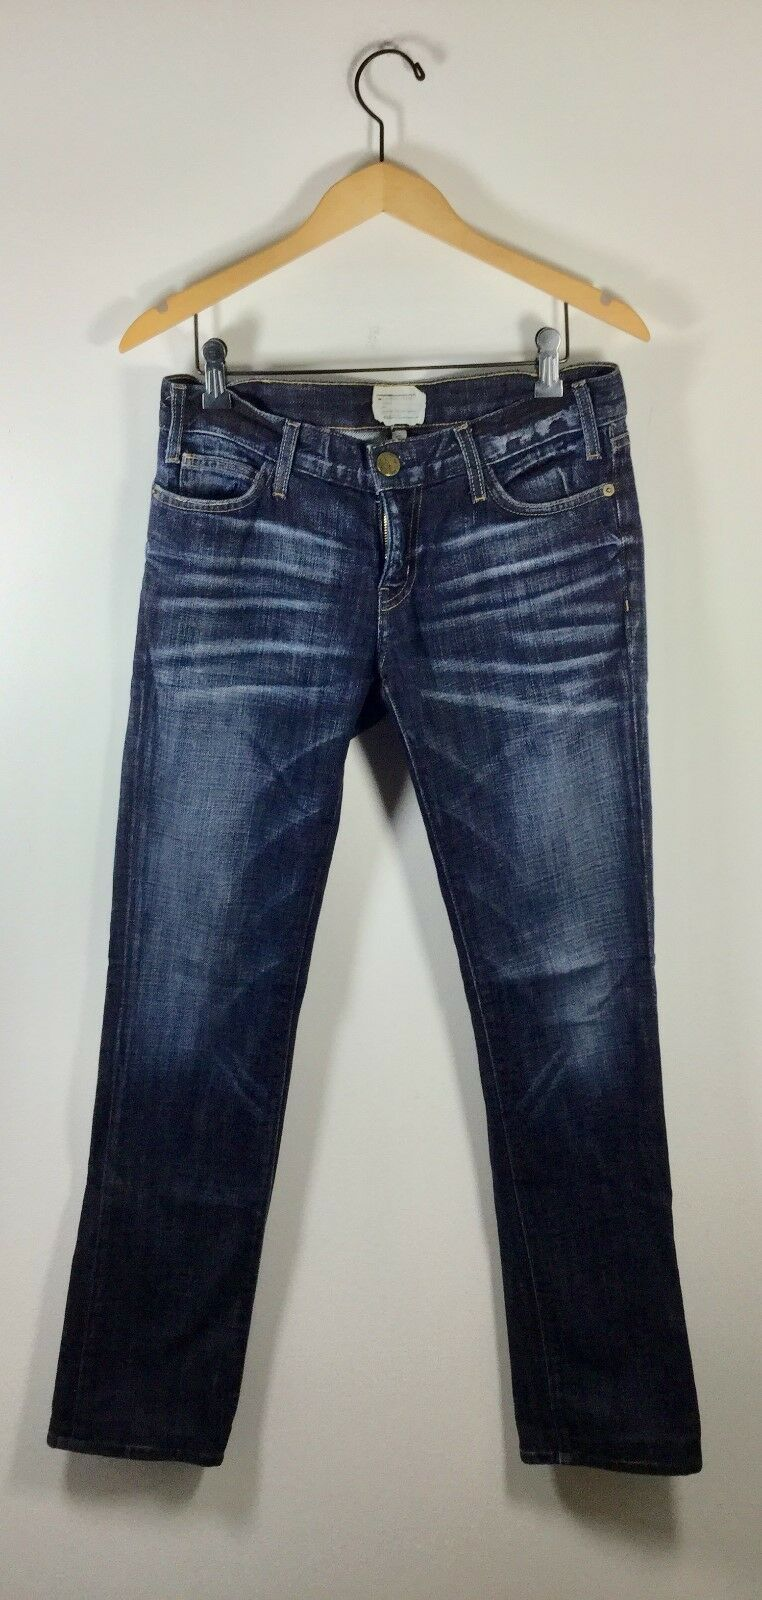 CURRENT ELLIOTT Medium Wash Size 27 Straight Leg Denim Jeans